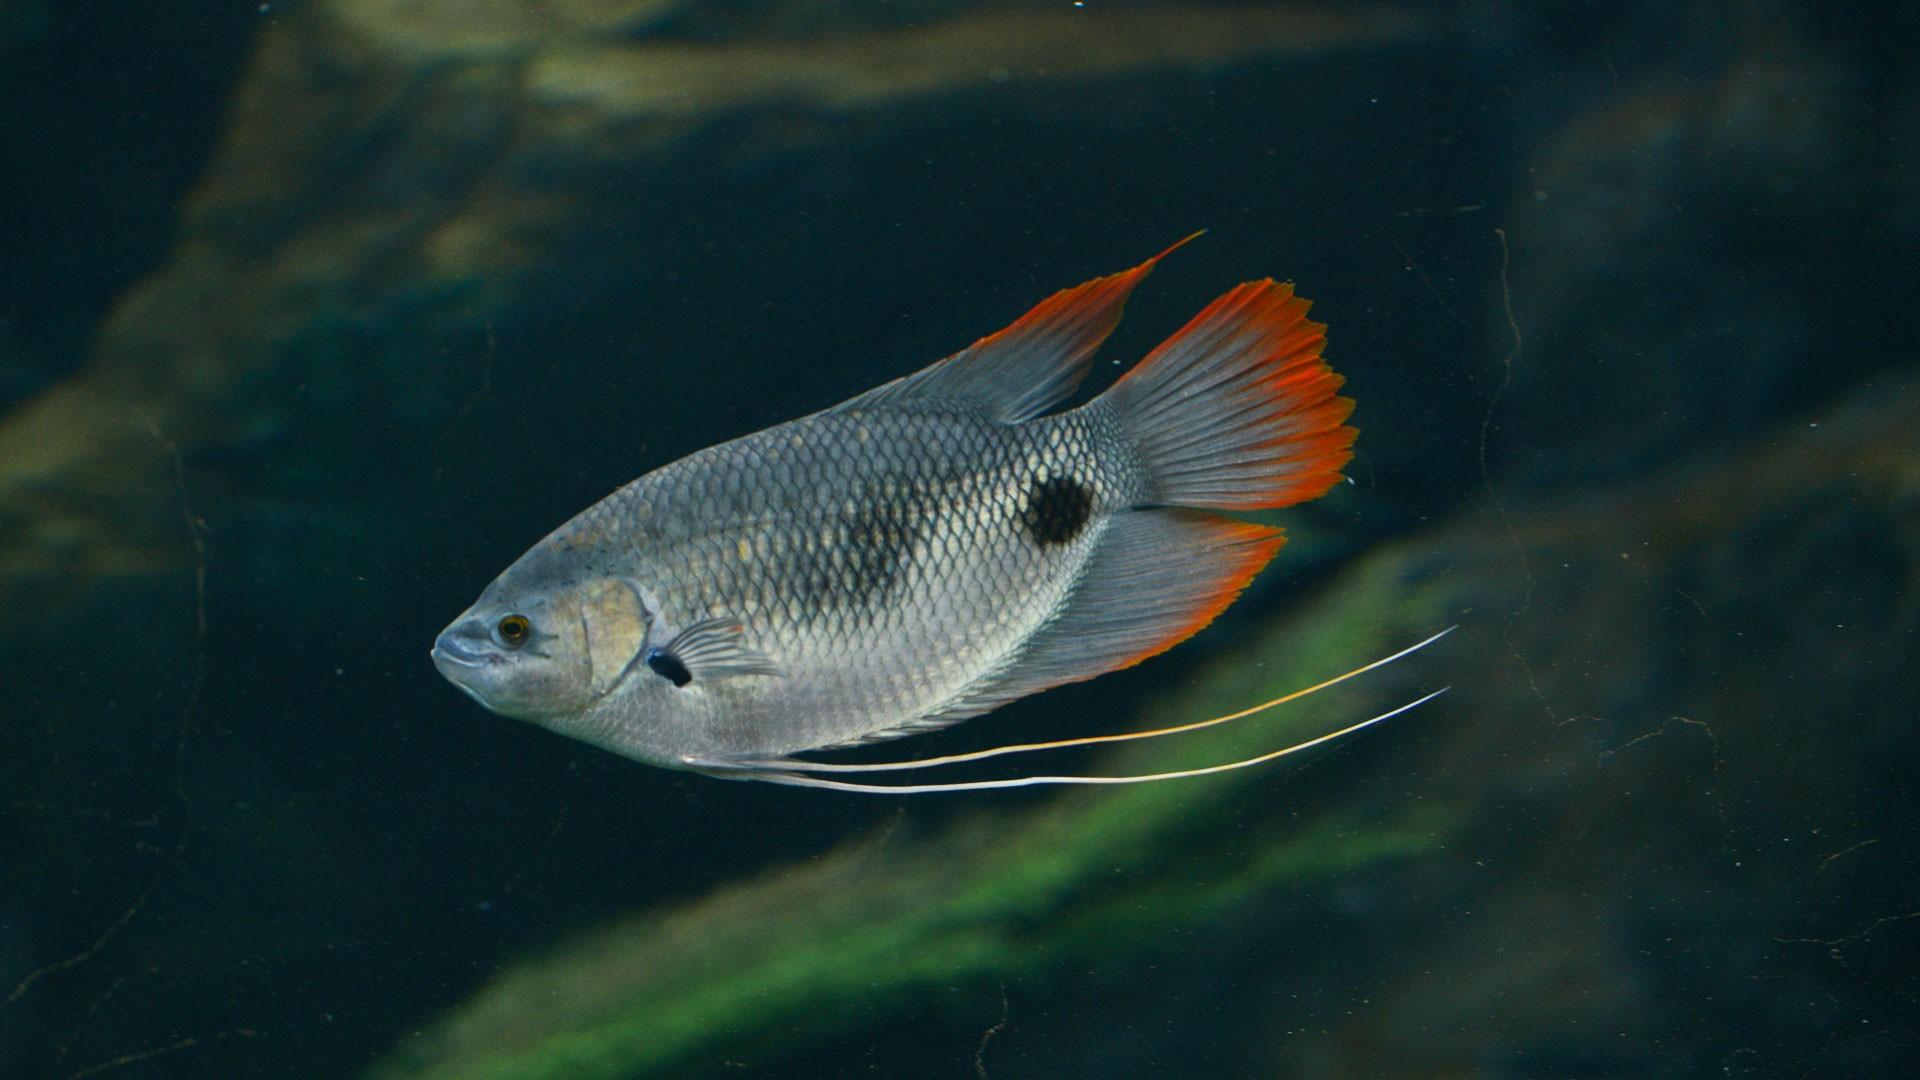 Red-tailed Gourami